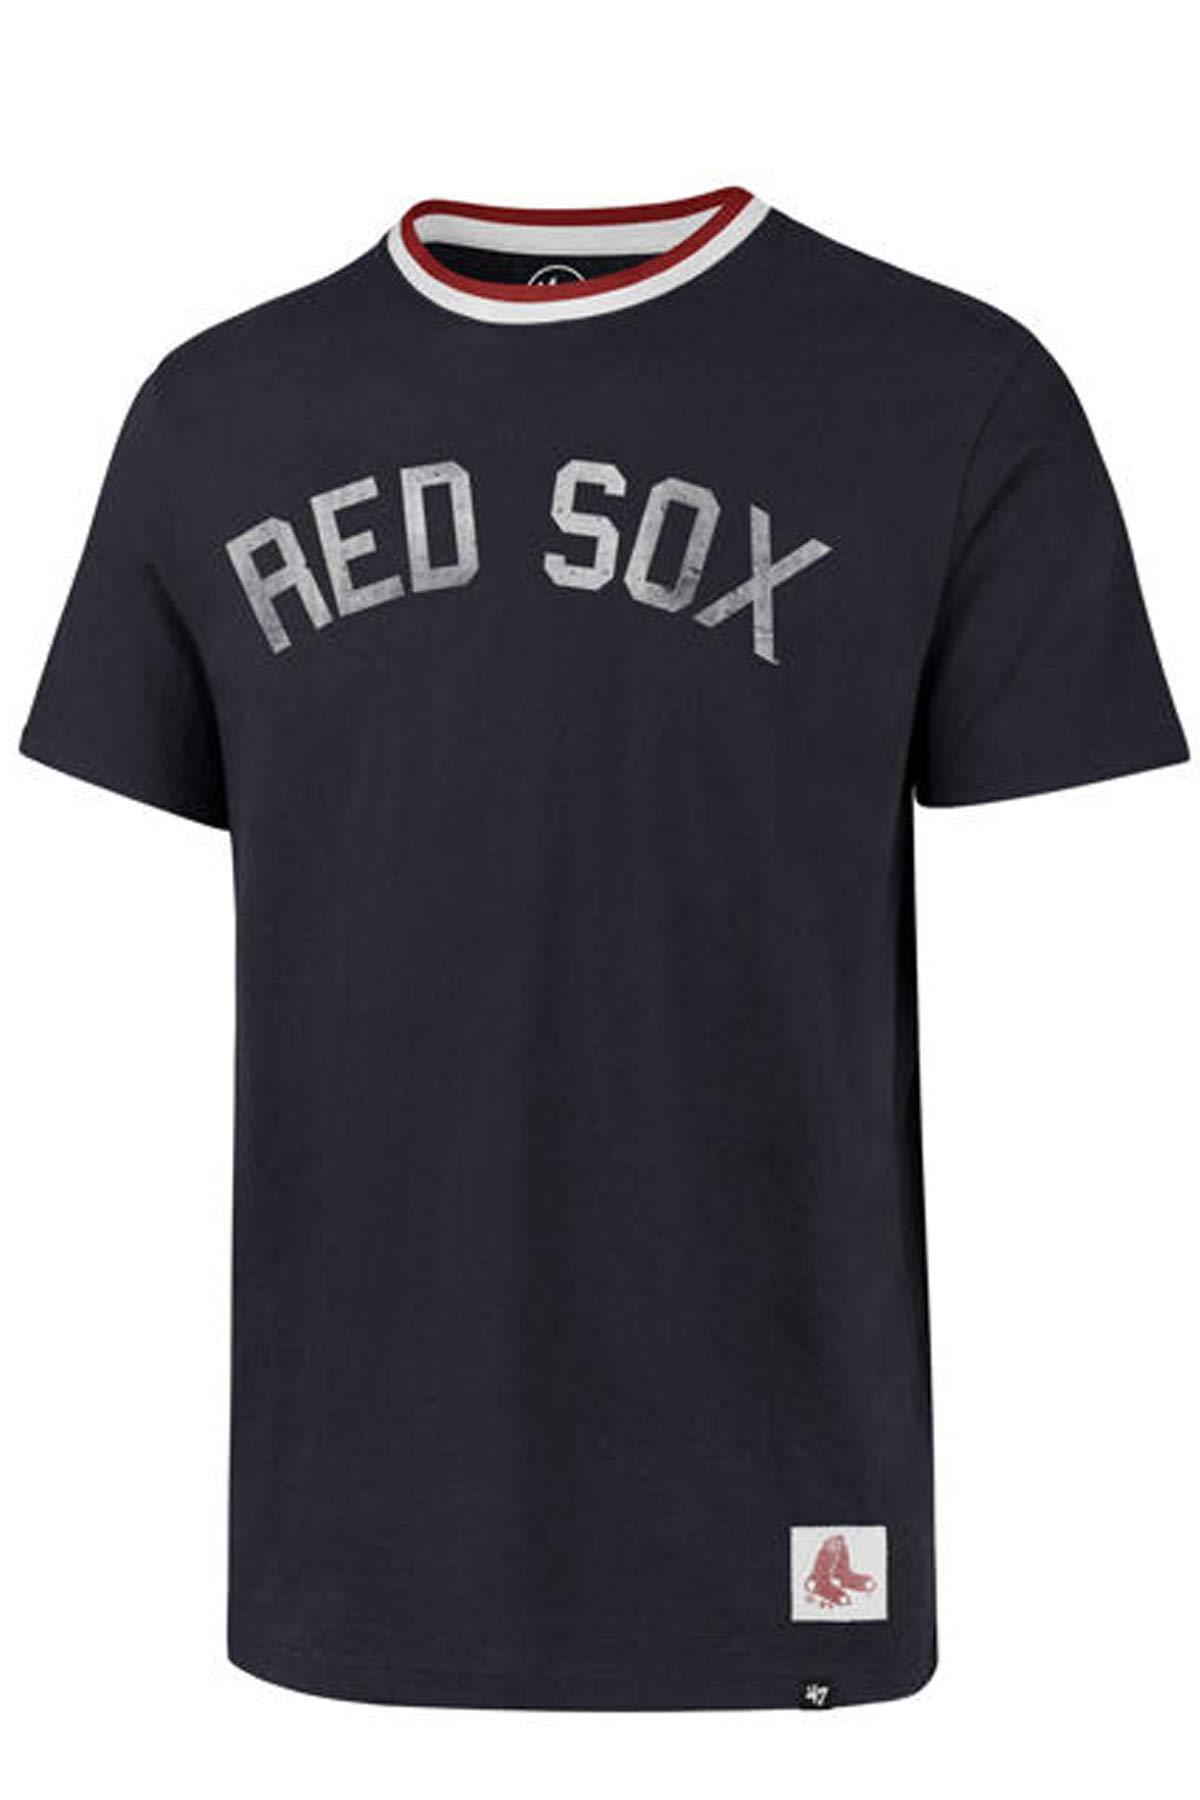 '47 Mens Boston Red Sox Scrum T Shirt (Midnight, Large)